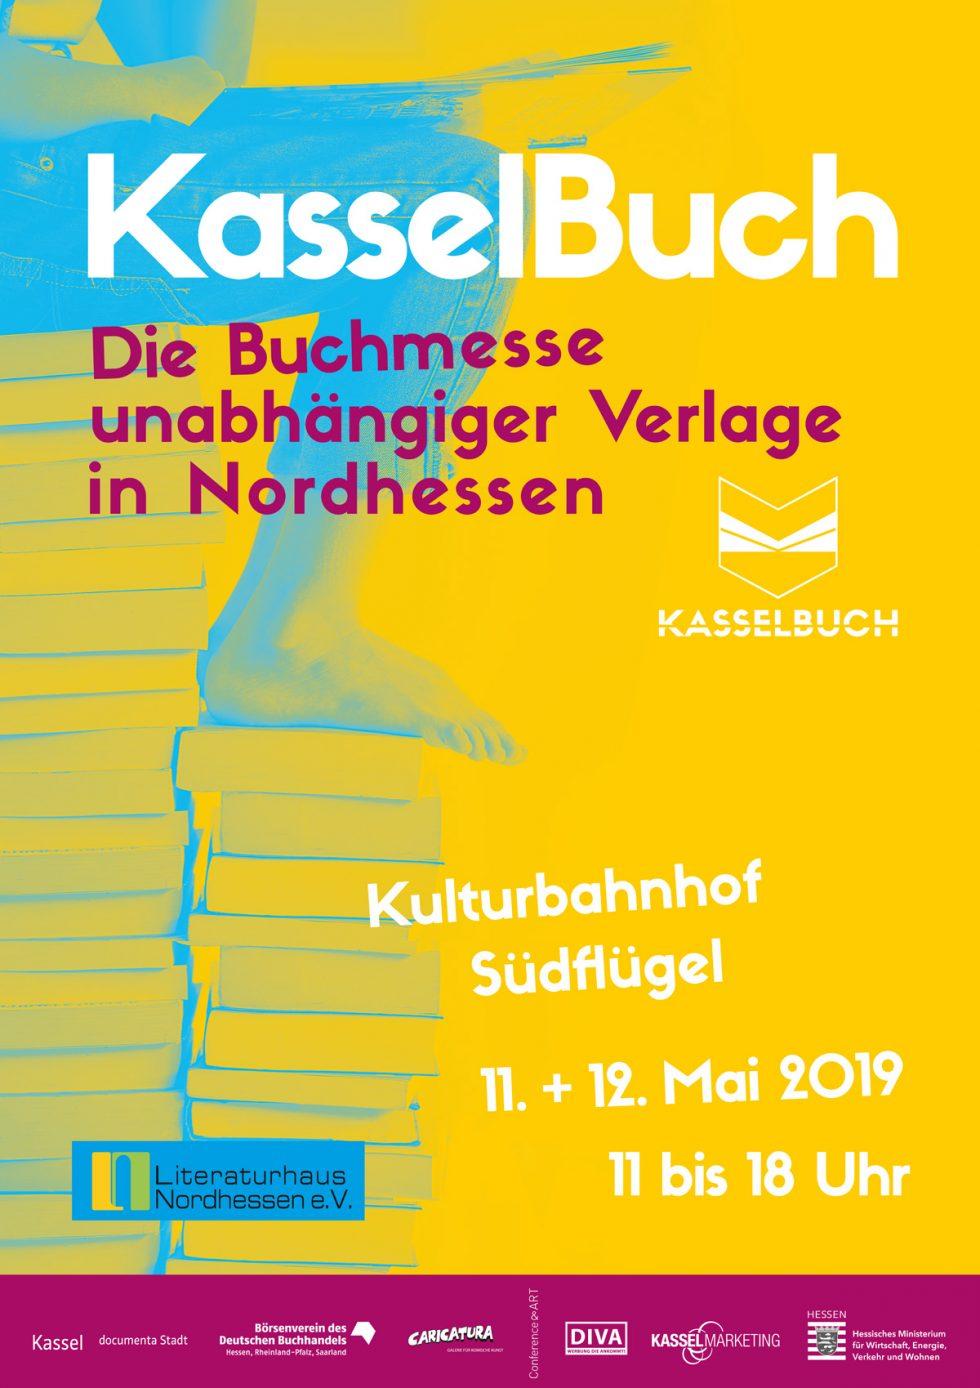 KasselBuch 2019, Plakat